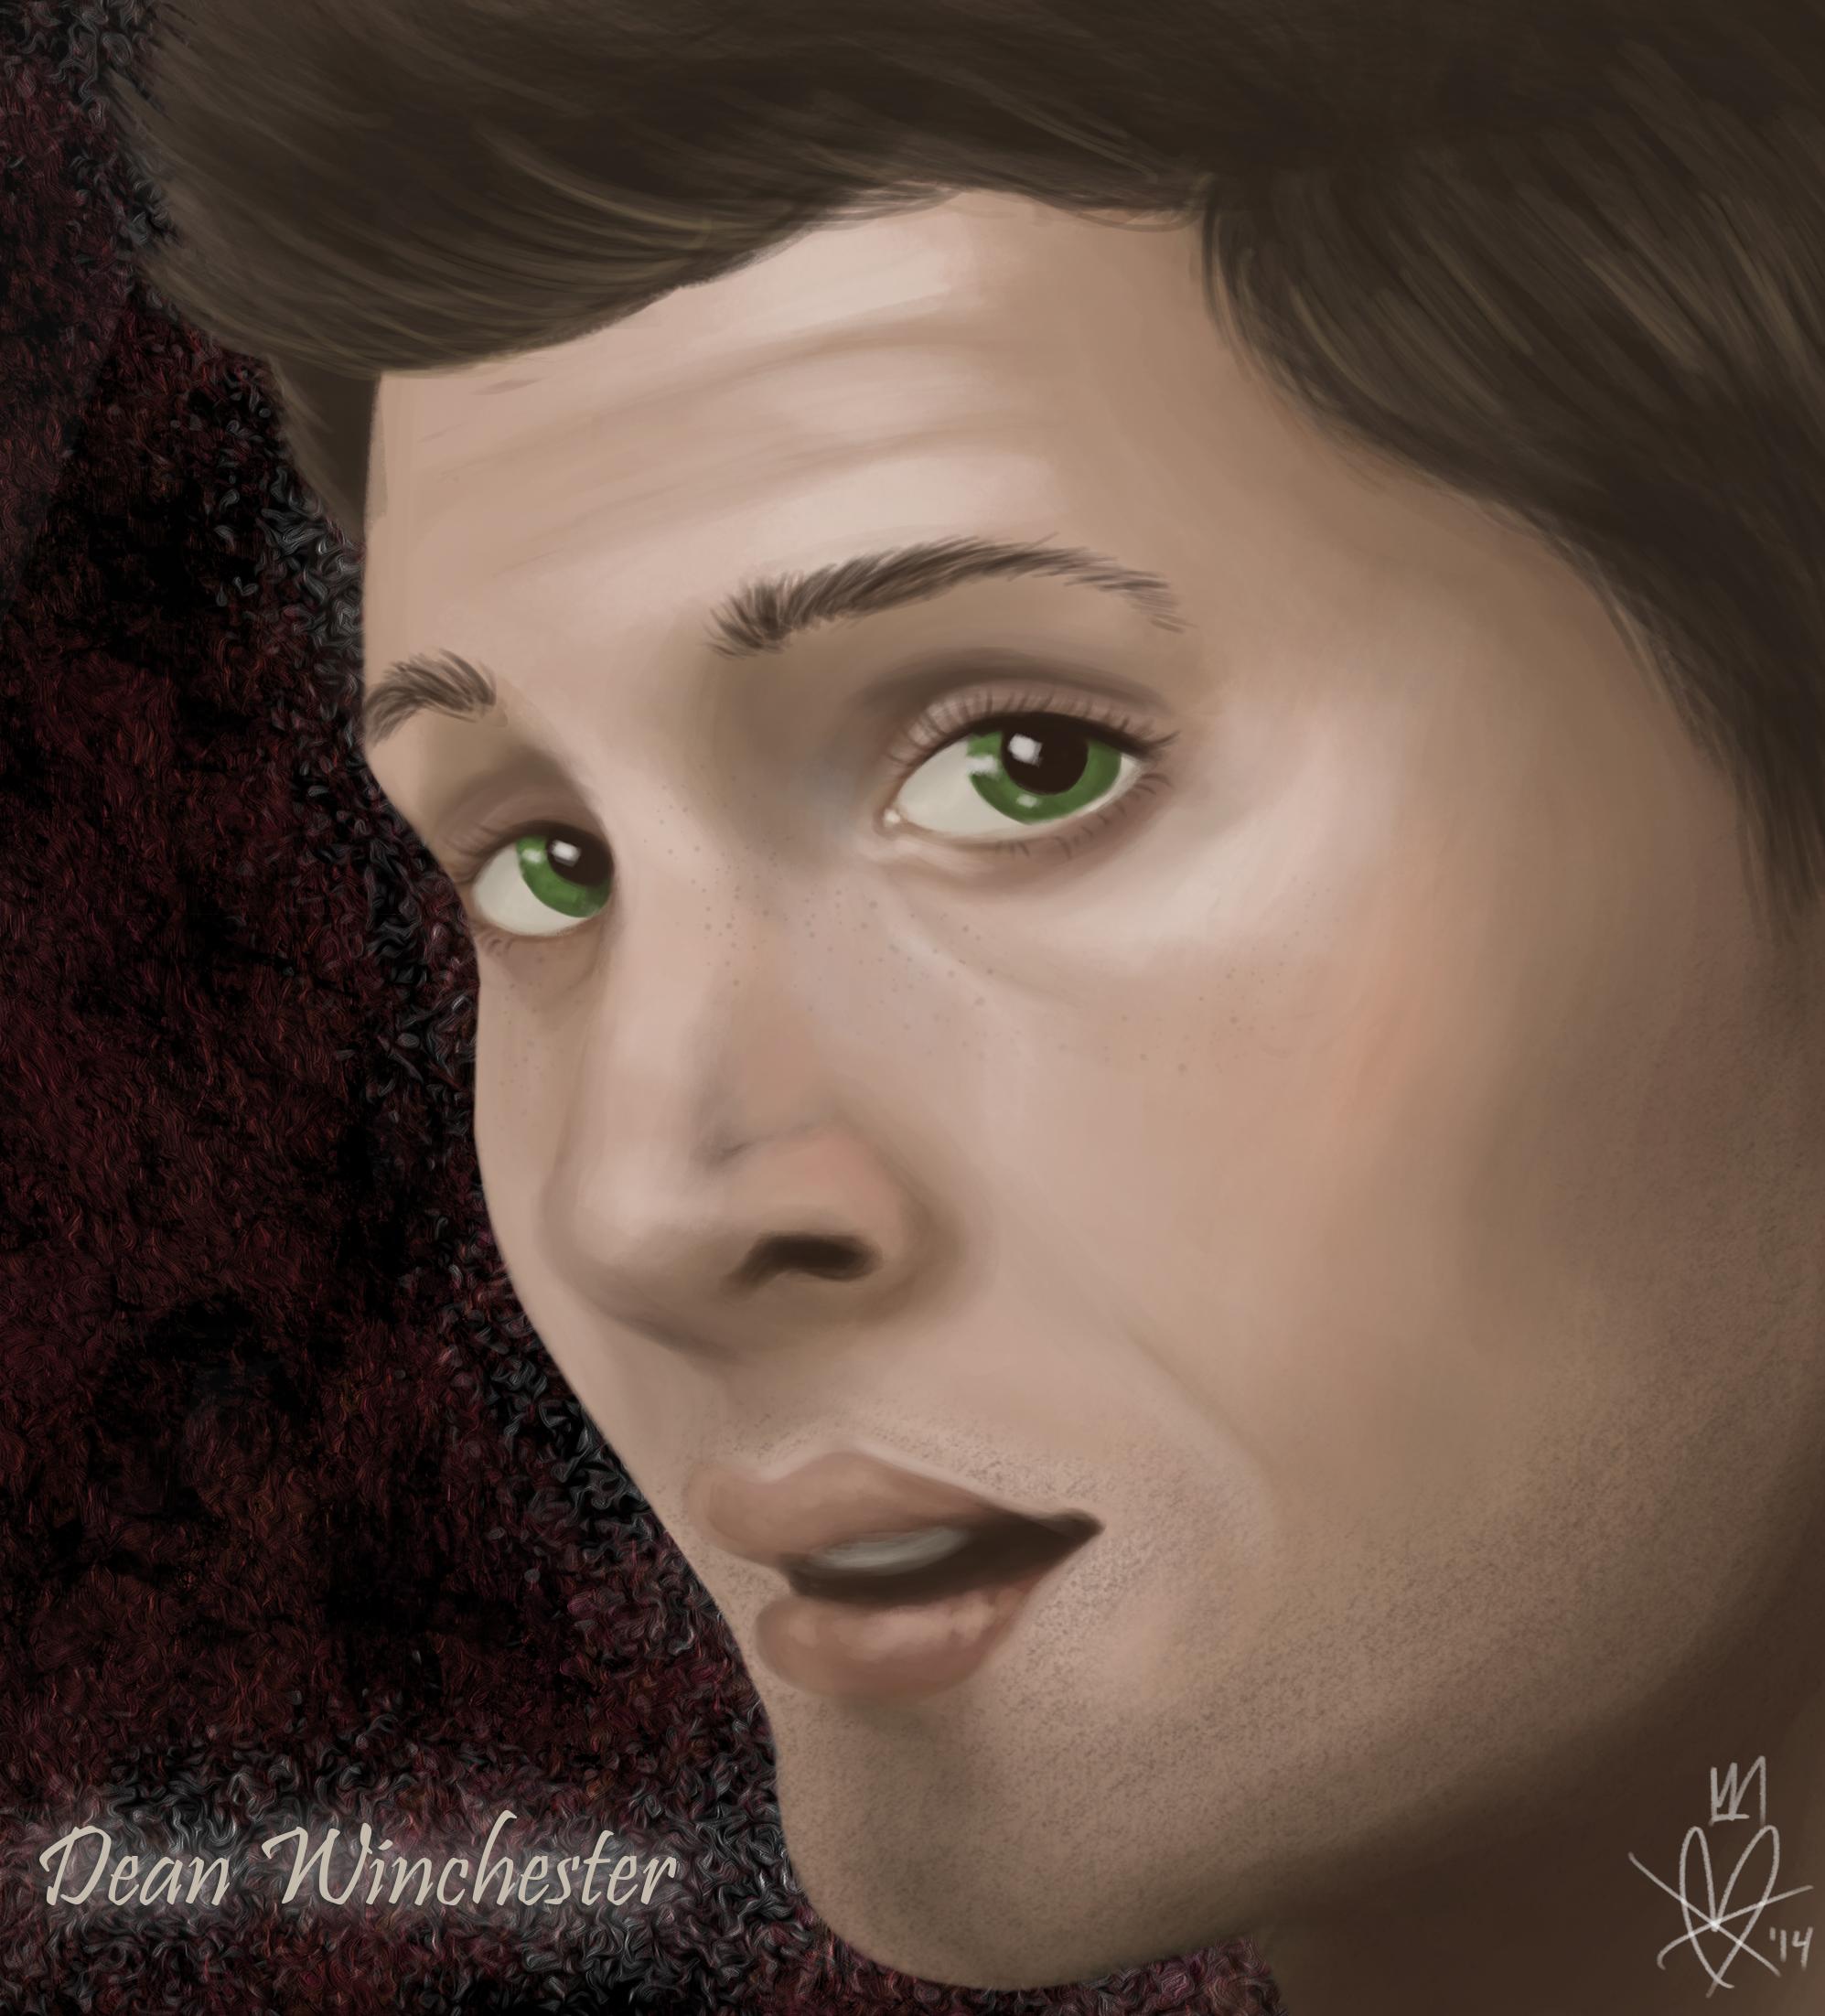 Dean Winchester - Realism pt.1